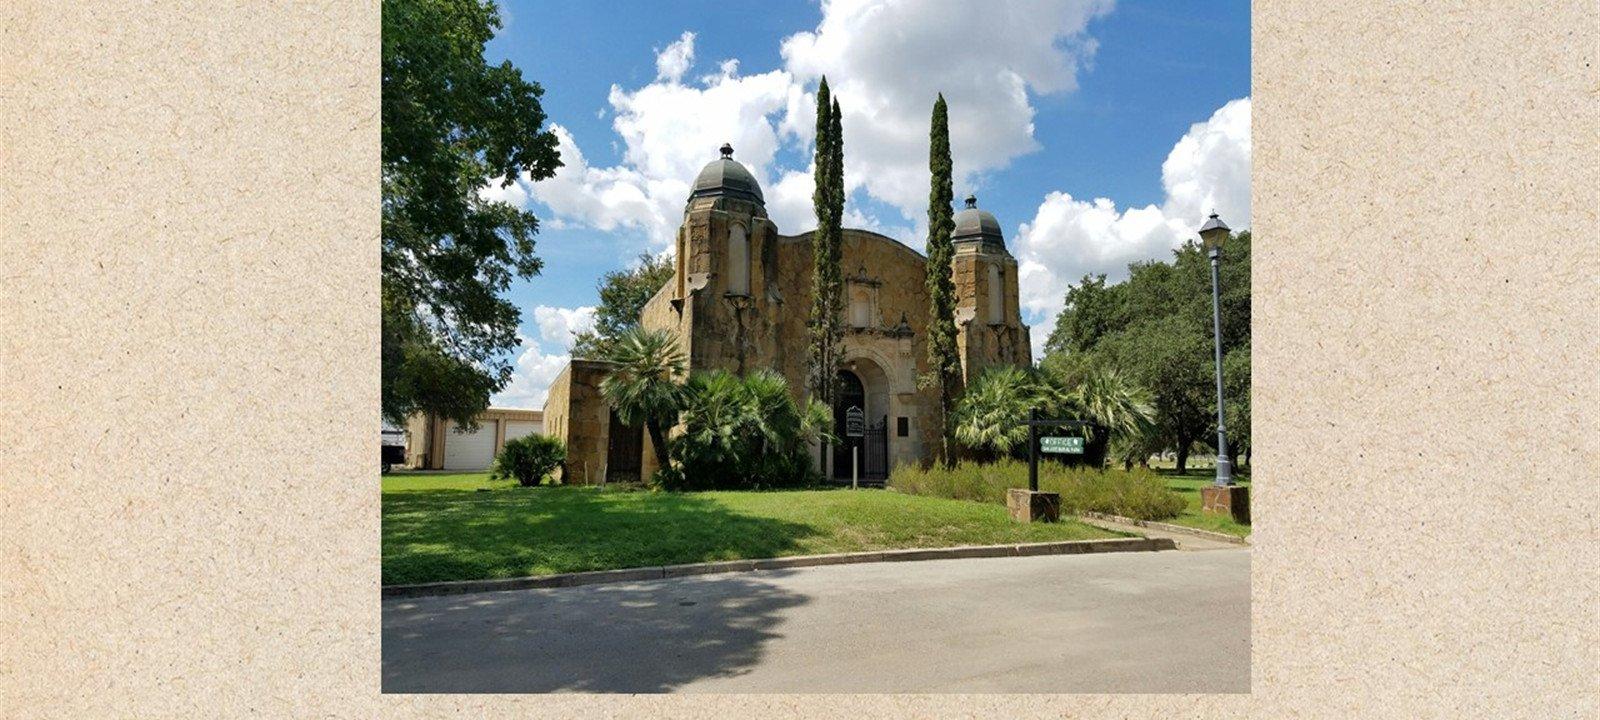 Dellcrest Funeral Home - San Antonio, Texas (TX) - Comal ...